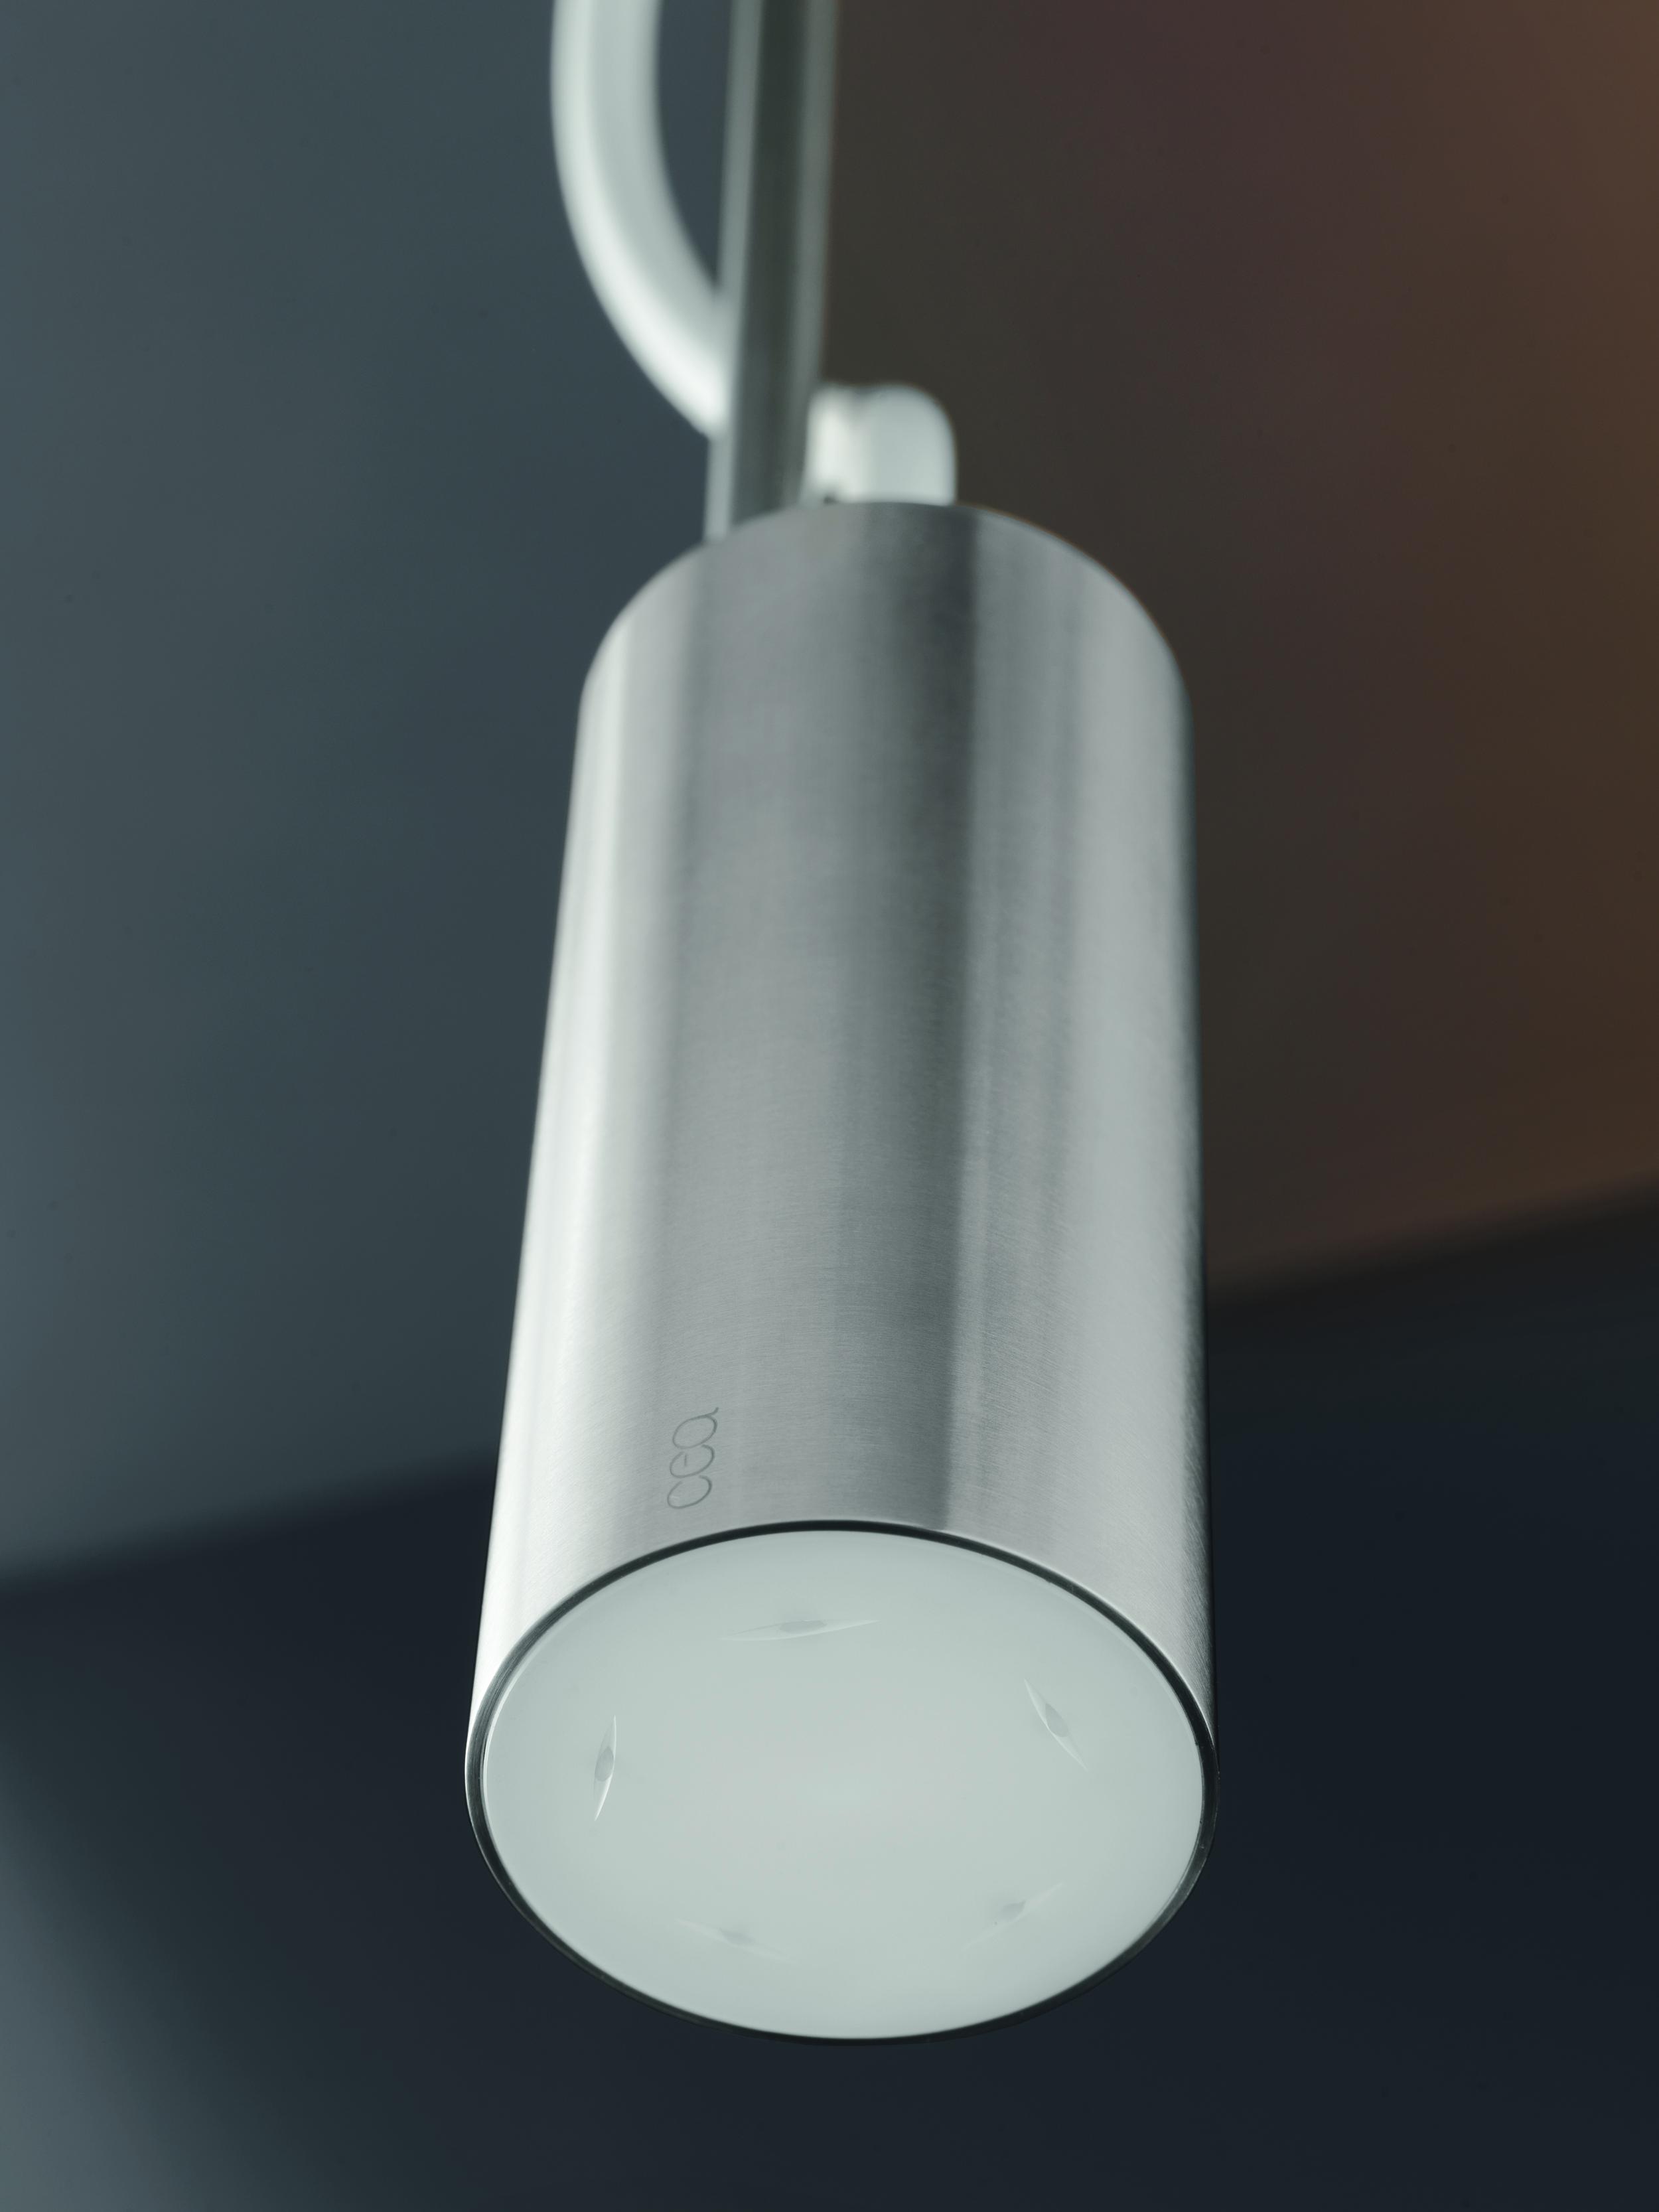 Contemporary Asta Ceiling Mount Shower Head